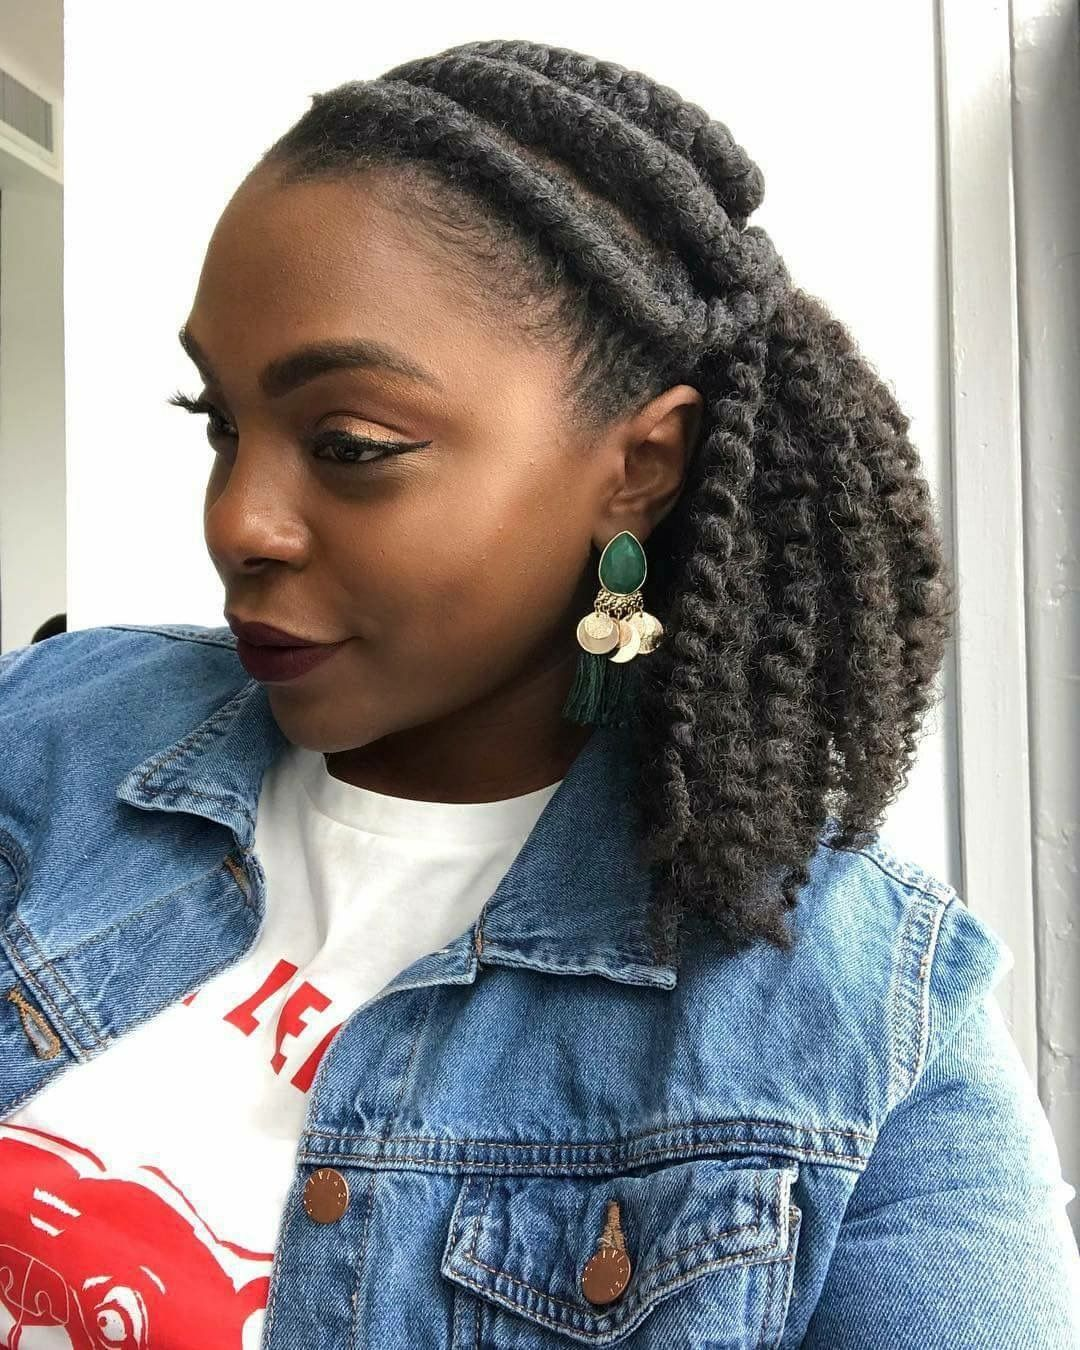 Natural black hairstyles for women hairstyleforblackwomen.net 19